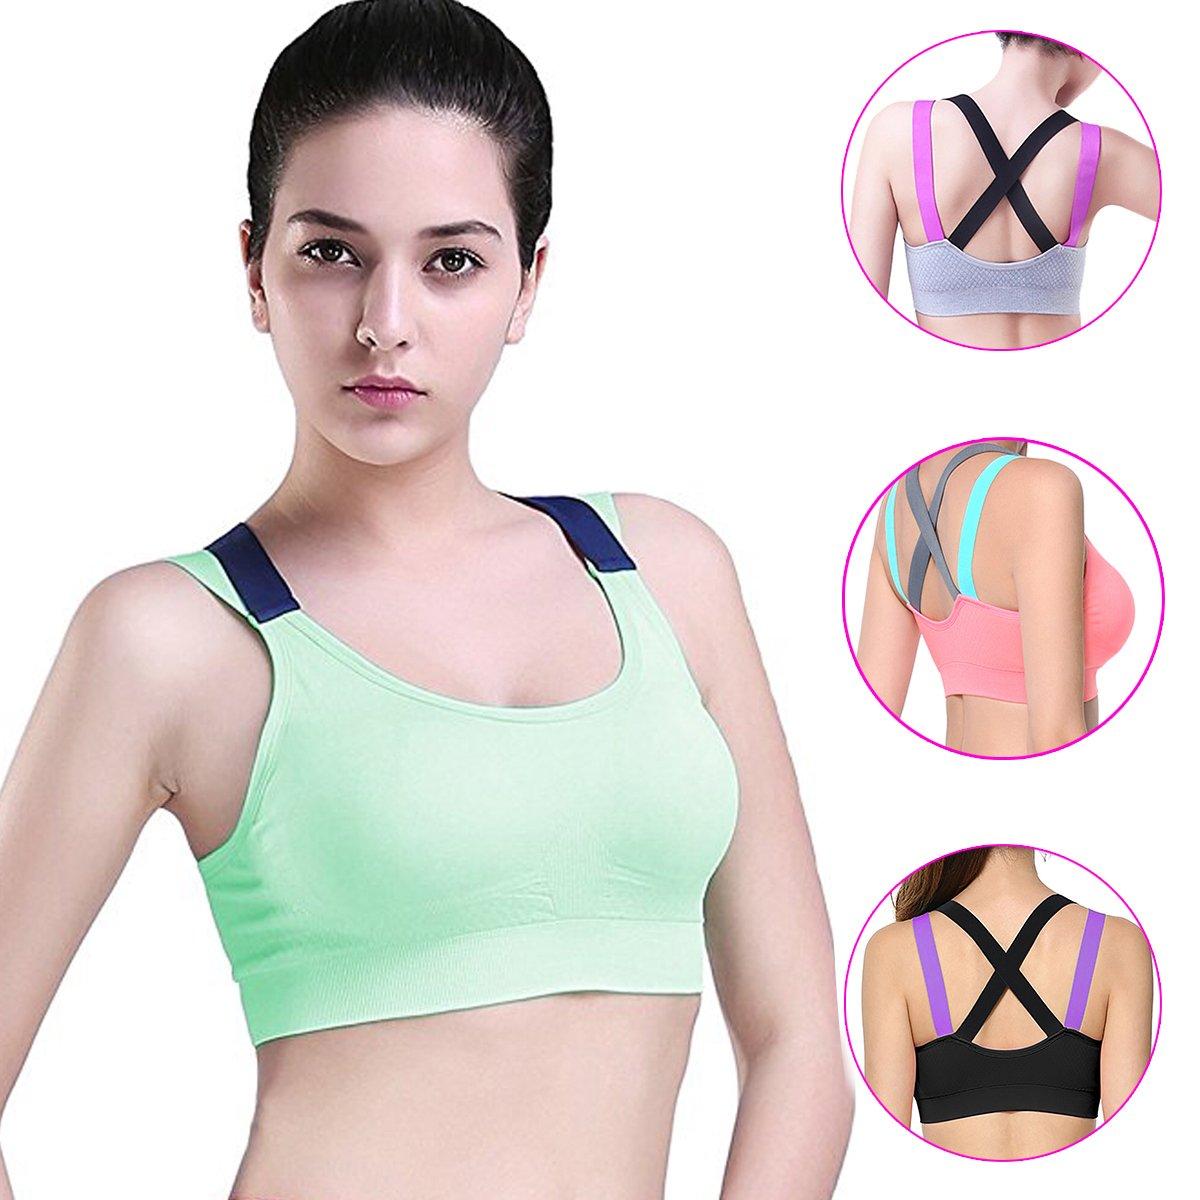 Yusamy Racerback Sports Bras for Women Padded High Impact Workout Yoga Strappy Bra